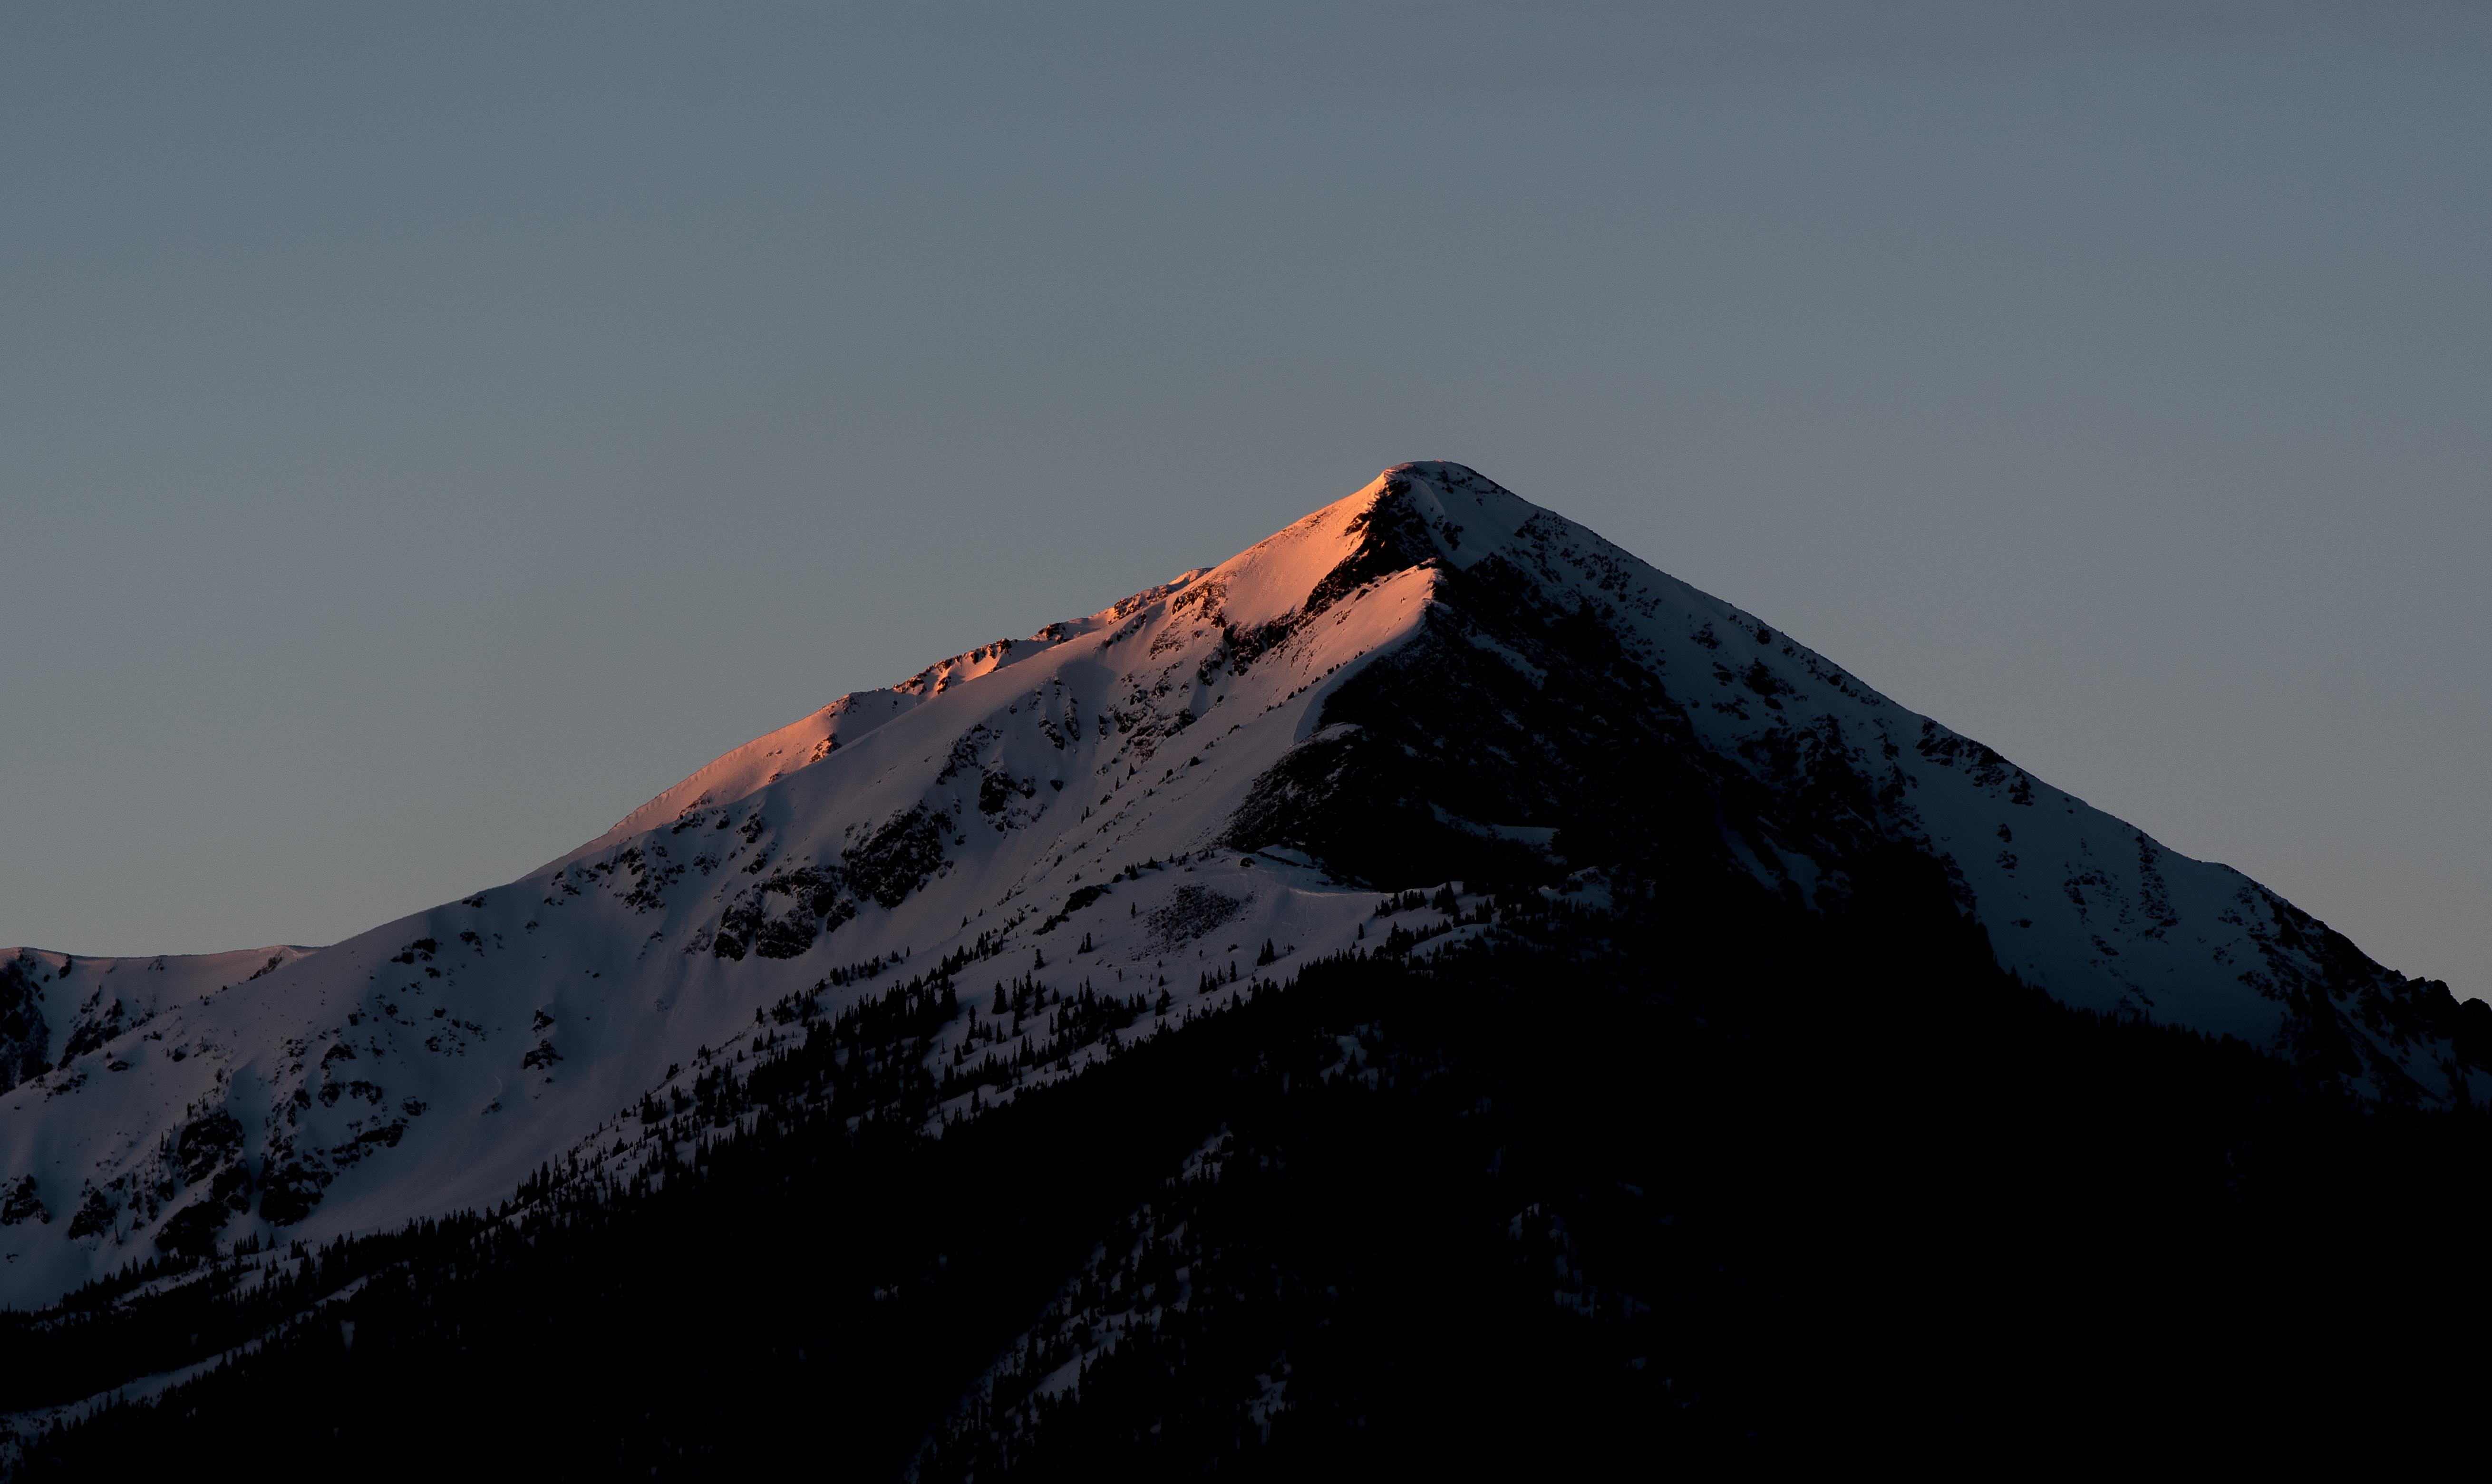 snow-capped mountain under dark sky